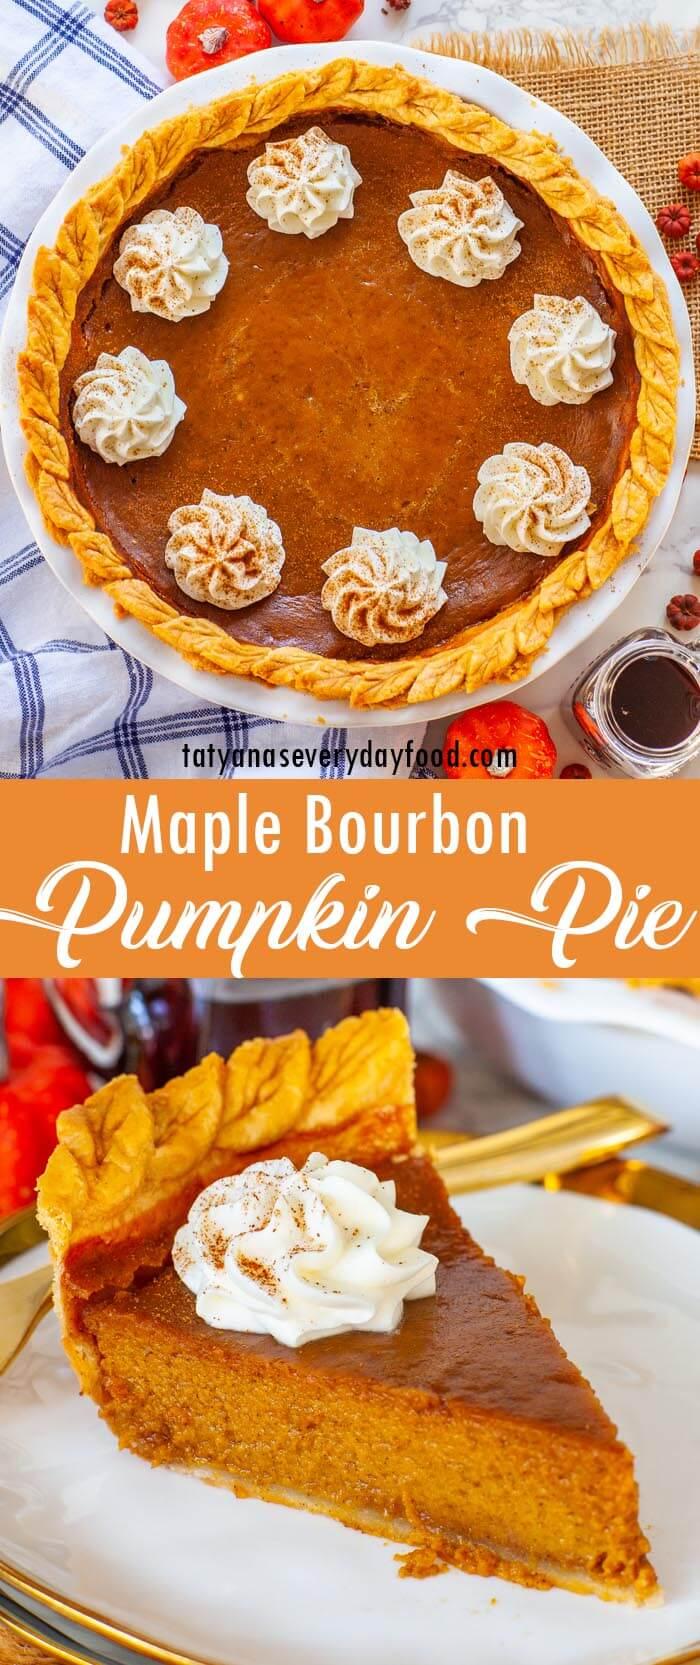 Bourbon Maple Pumpkin Pie video recipe